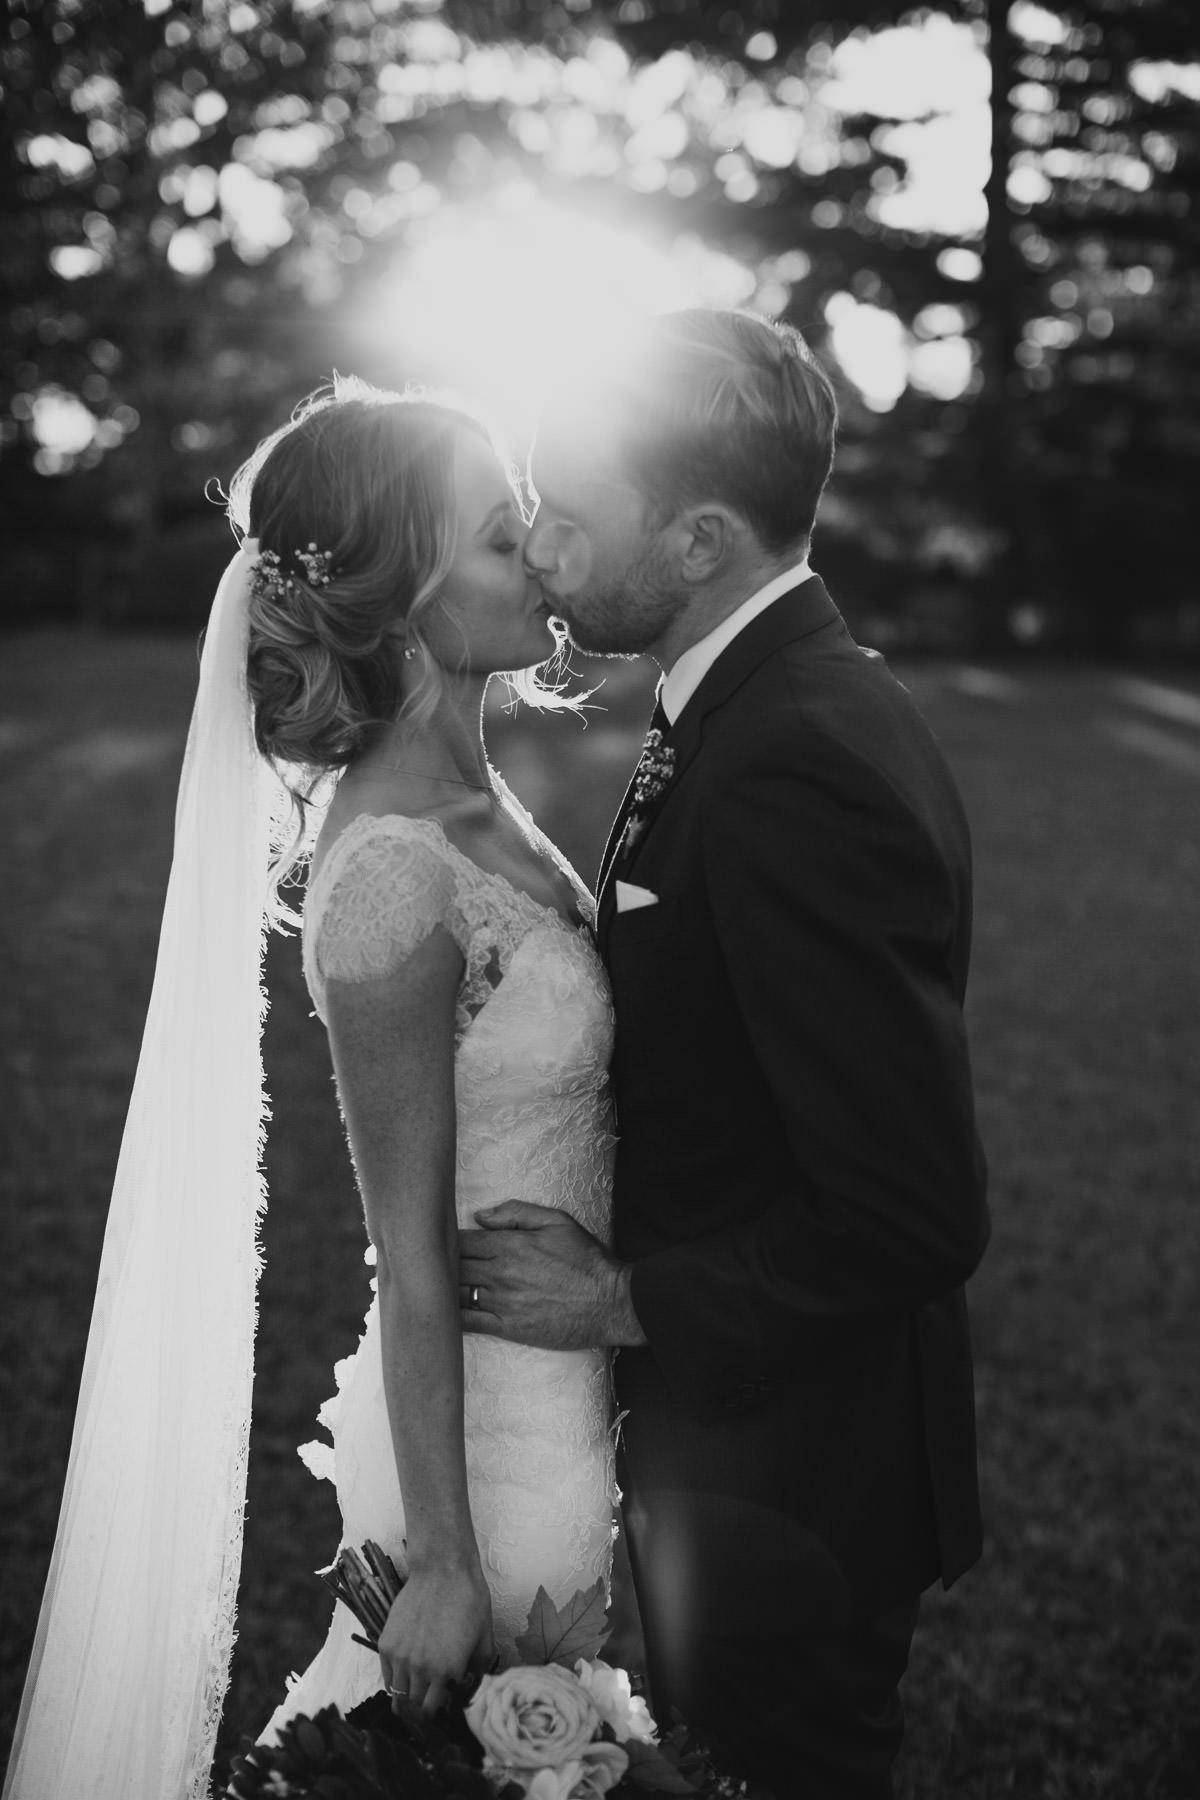 160506_justinaaron_wedding_holly_daniel_pr-169.jpg